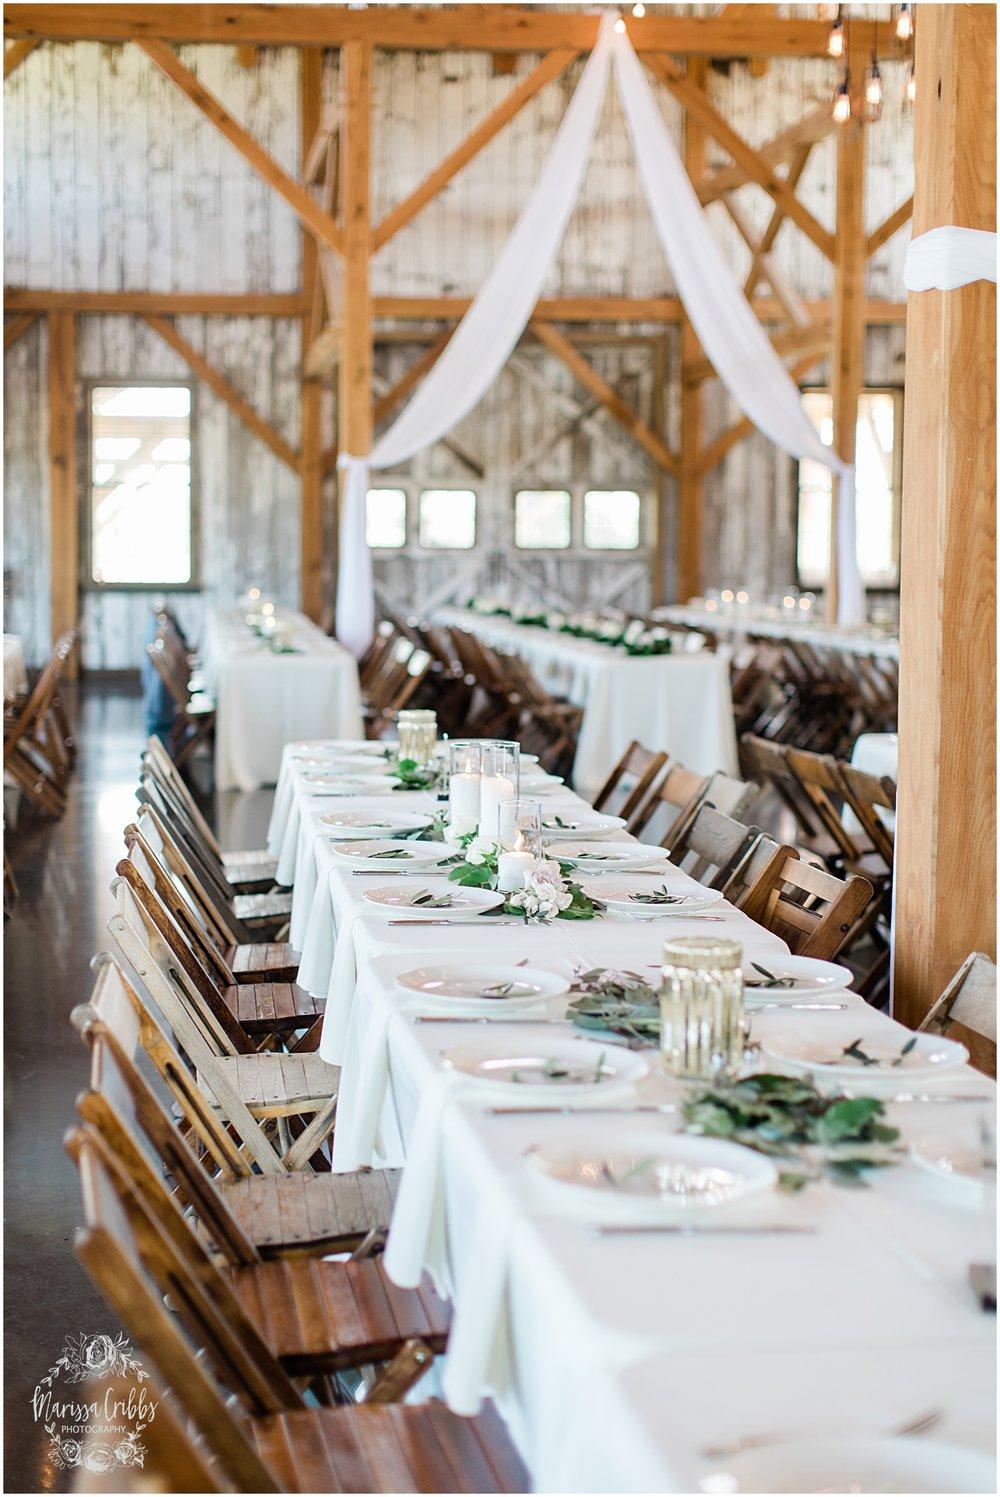 RHODES WEDDING | WESTON RED BARN FARM | MARISSA CRIBBS PHOTOGRAPHY_5295.jpg